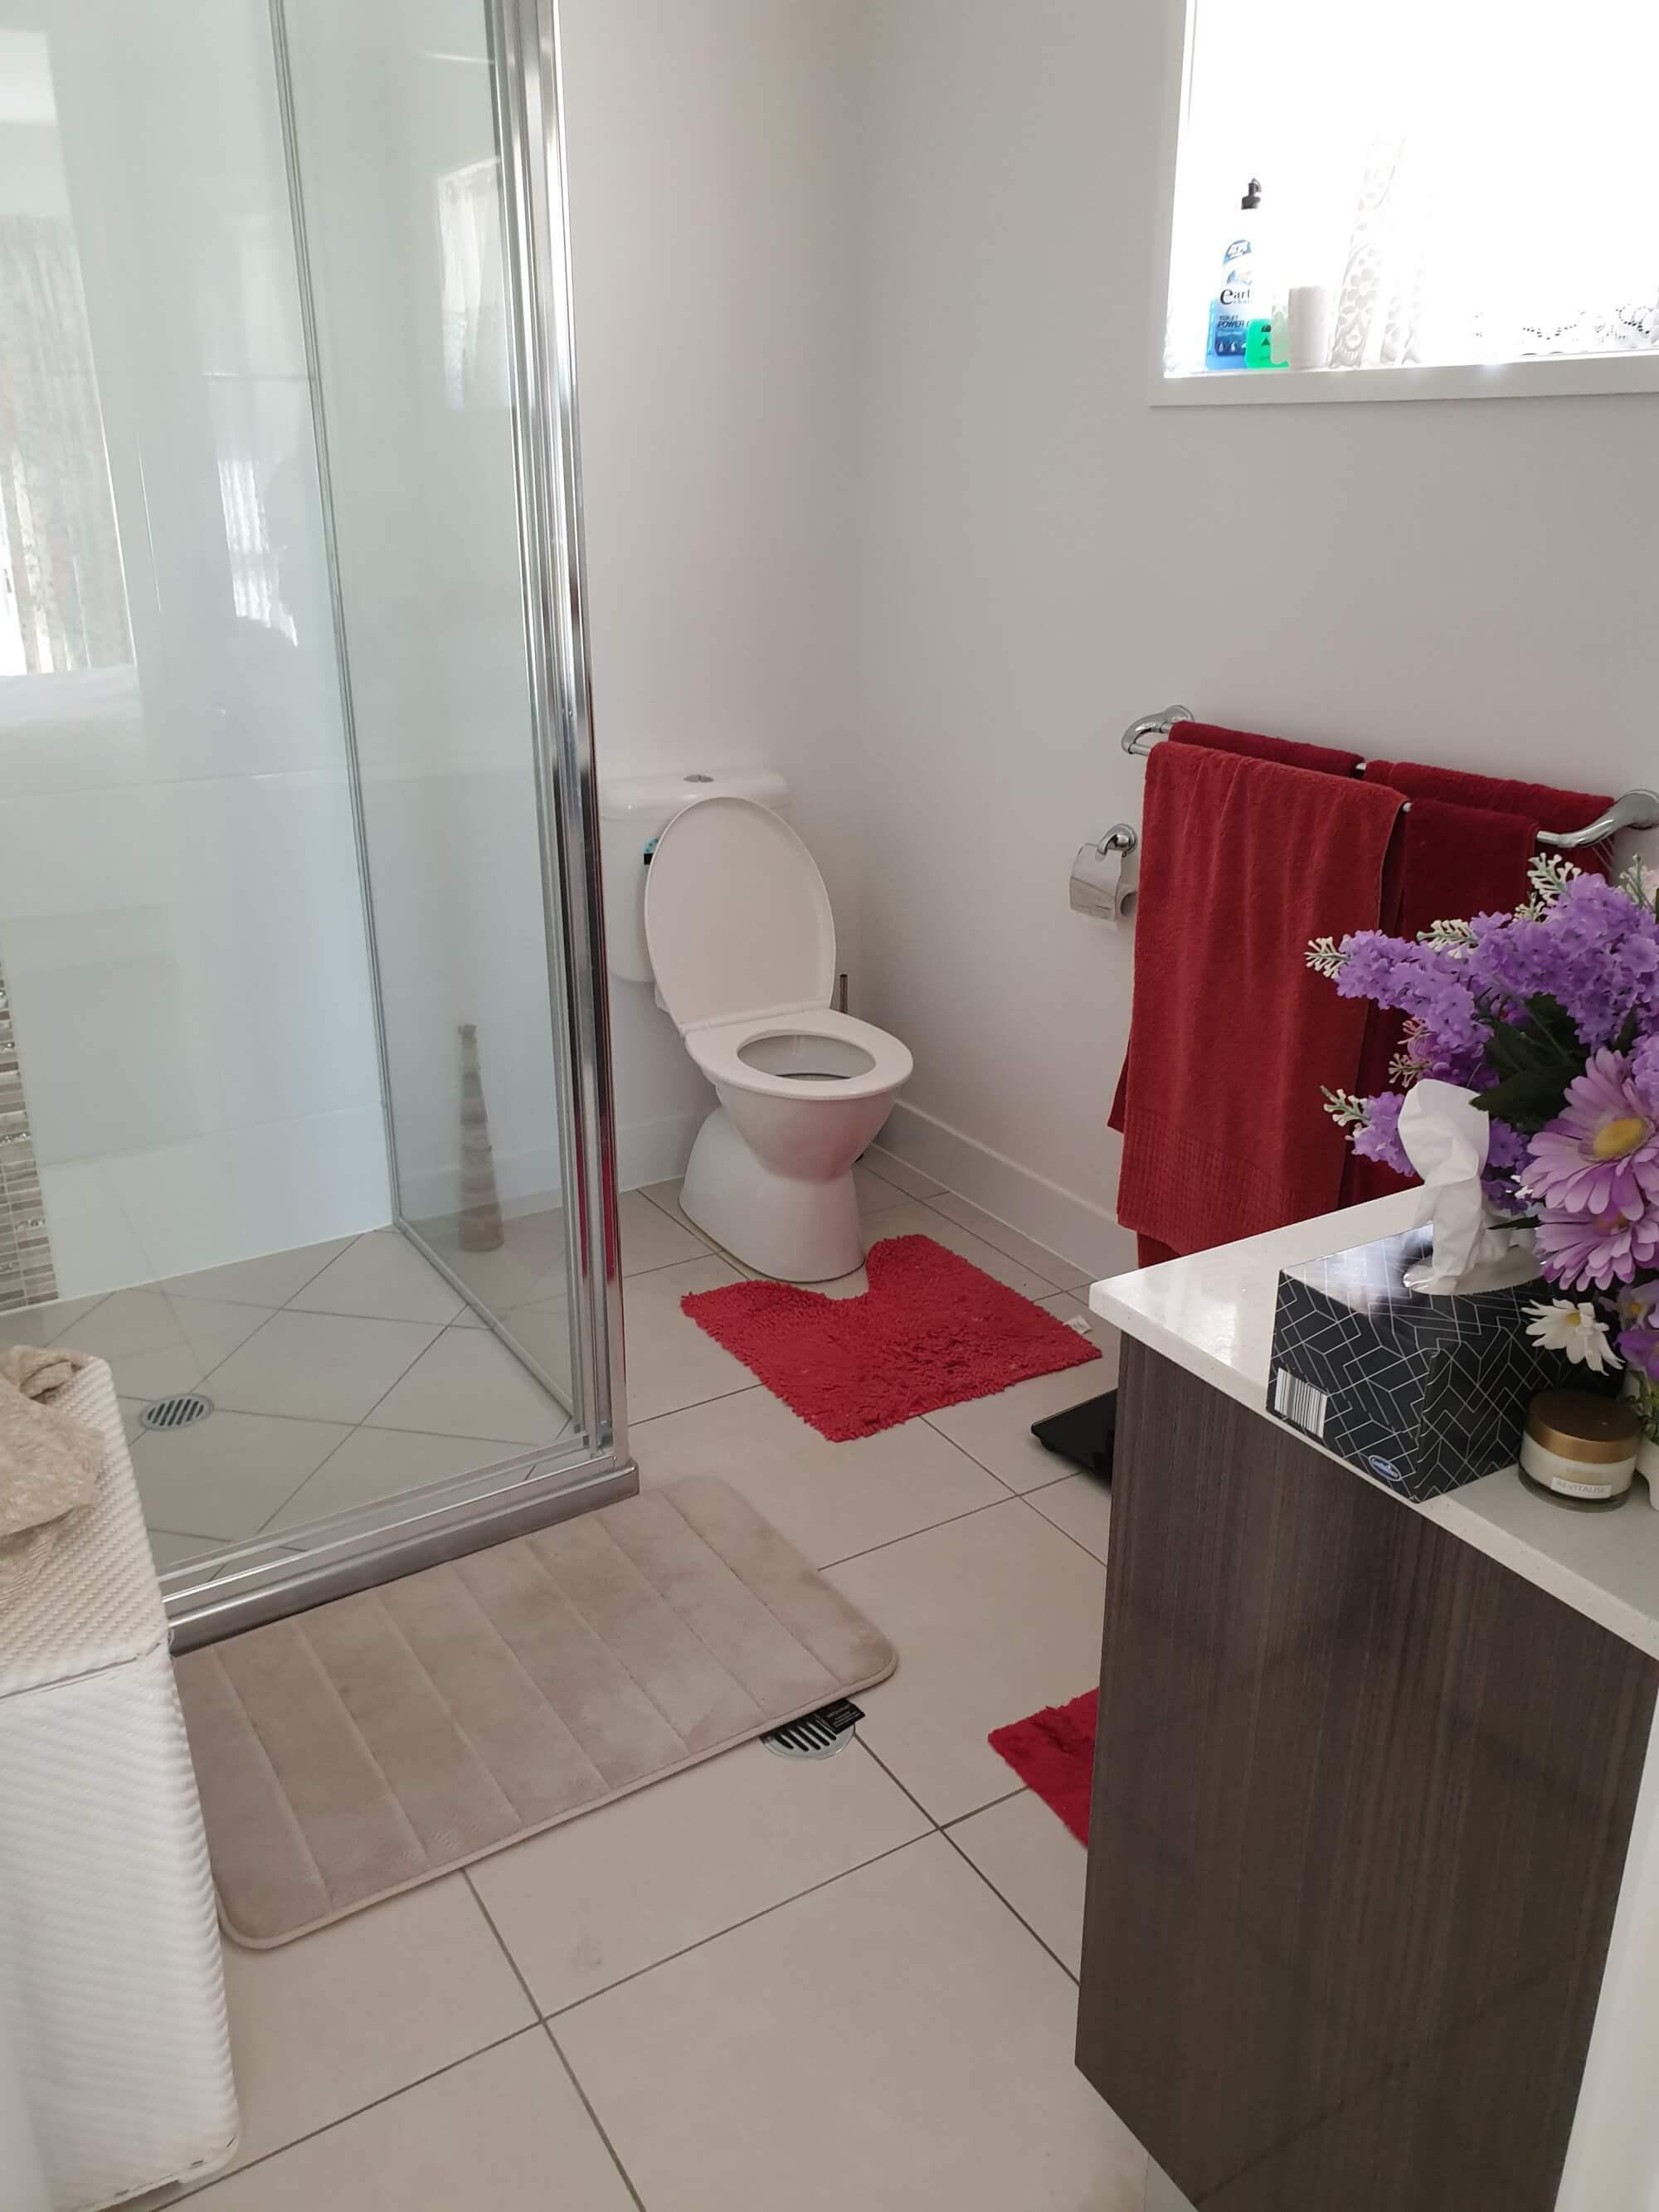 Property For Sale 15 Brolga Way Adare QLD 4343 5